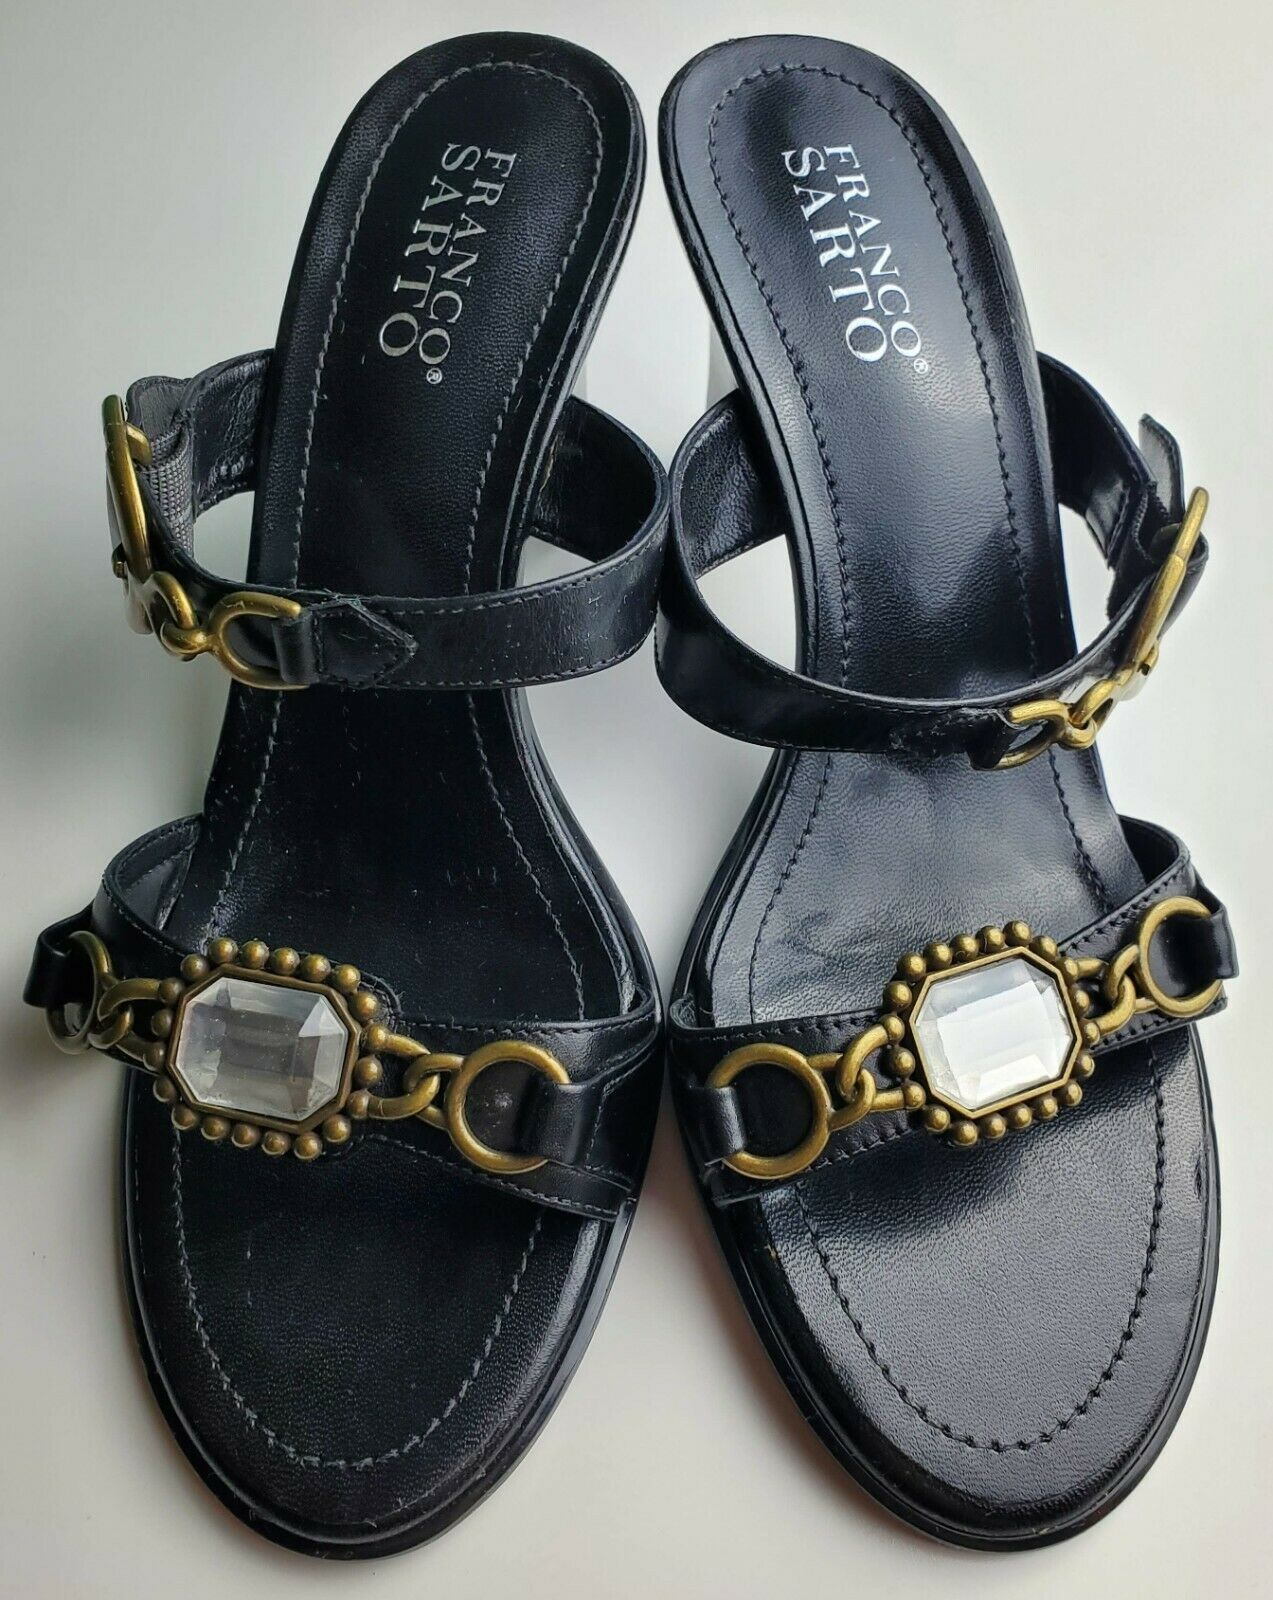 Franco Sarto Black Two Strap Women's Heels With Jewel Size 8.5 image 3